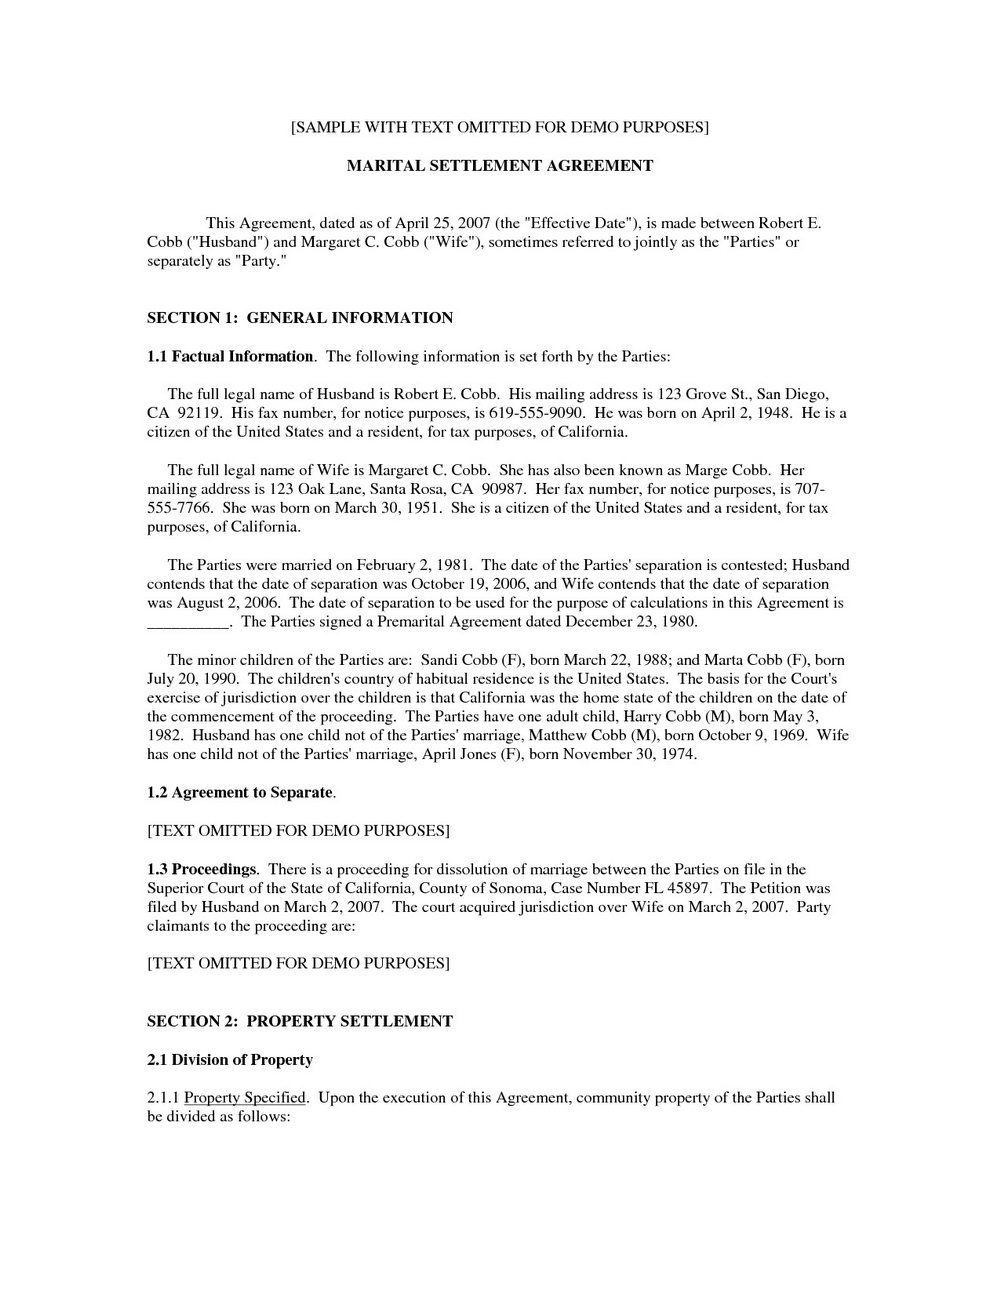 Marital Settlement Agreement Template